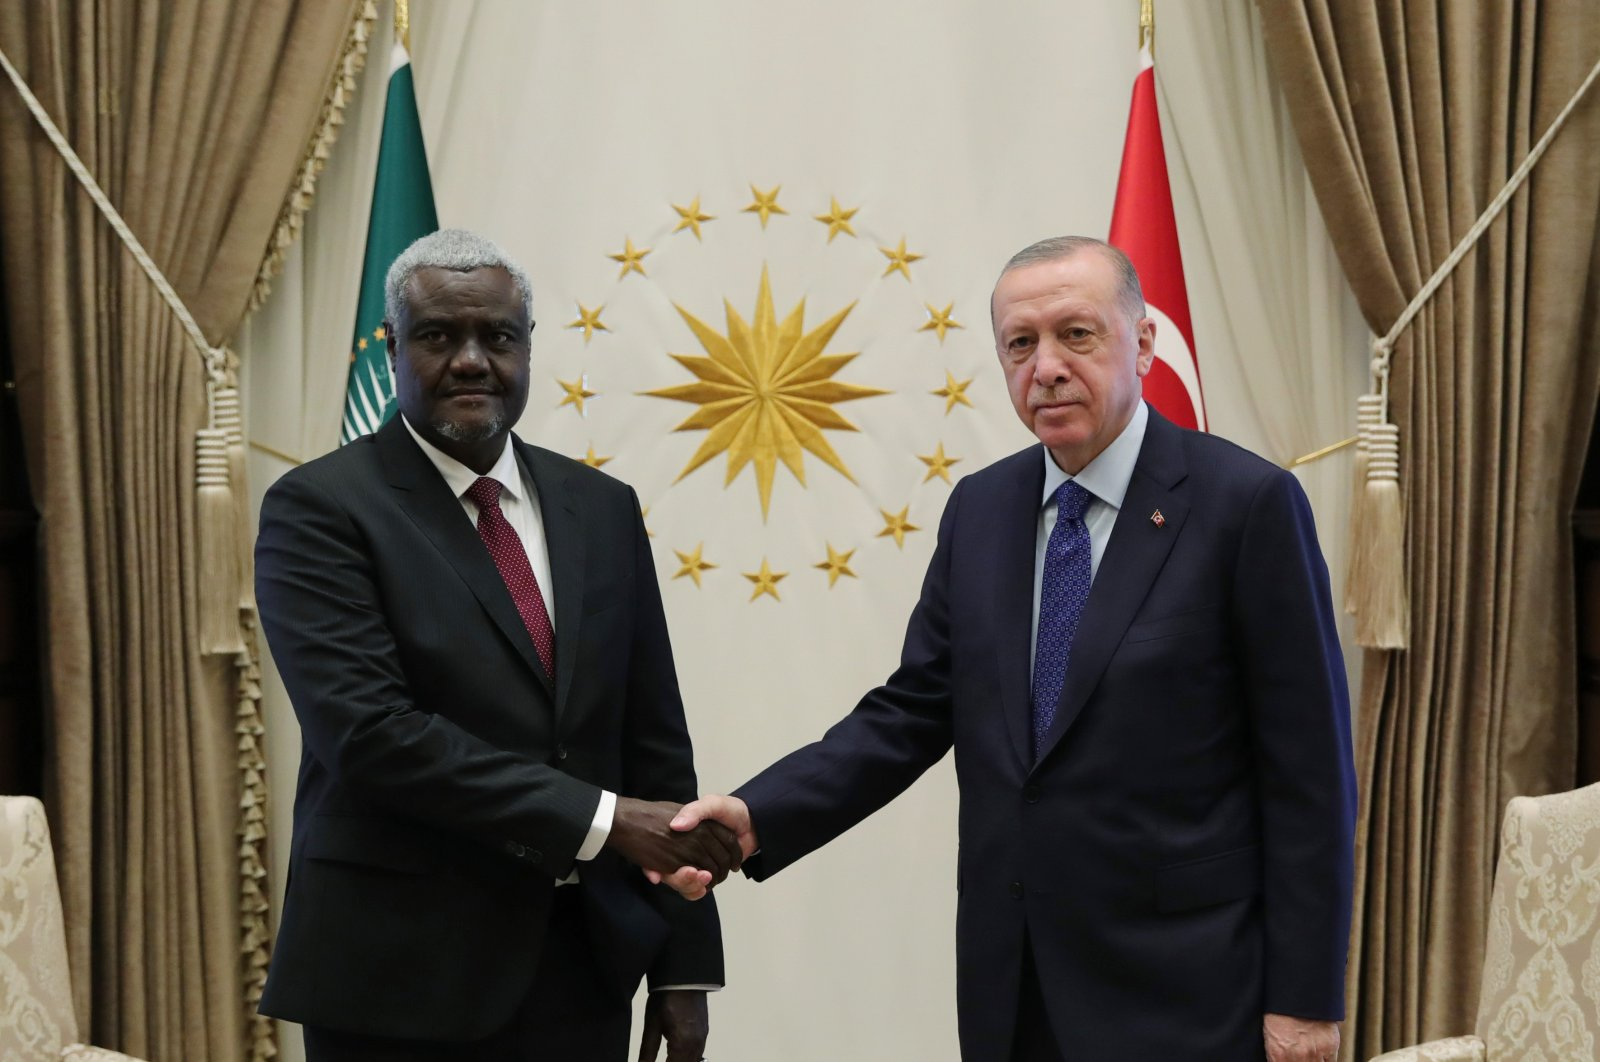 President Recep Tayyip Erodğan (R) receives African Union Commission Chair Moussa Faki Mahamat in the capital Ankara, Turkey, Sept. 30, 2021. (AA Photo)